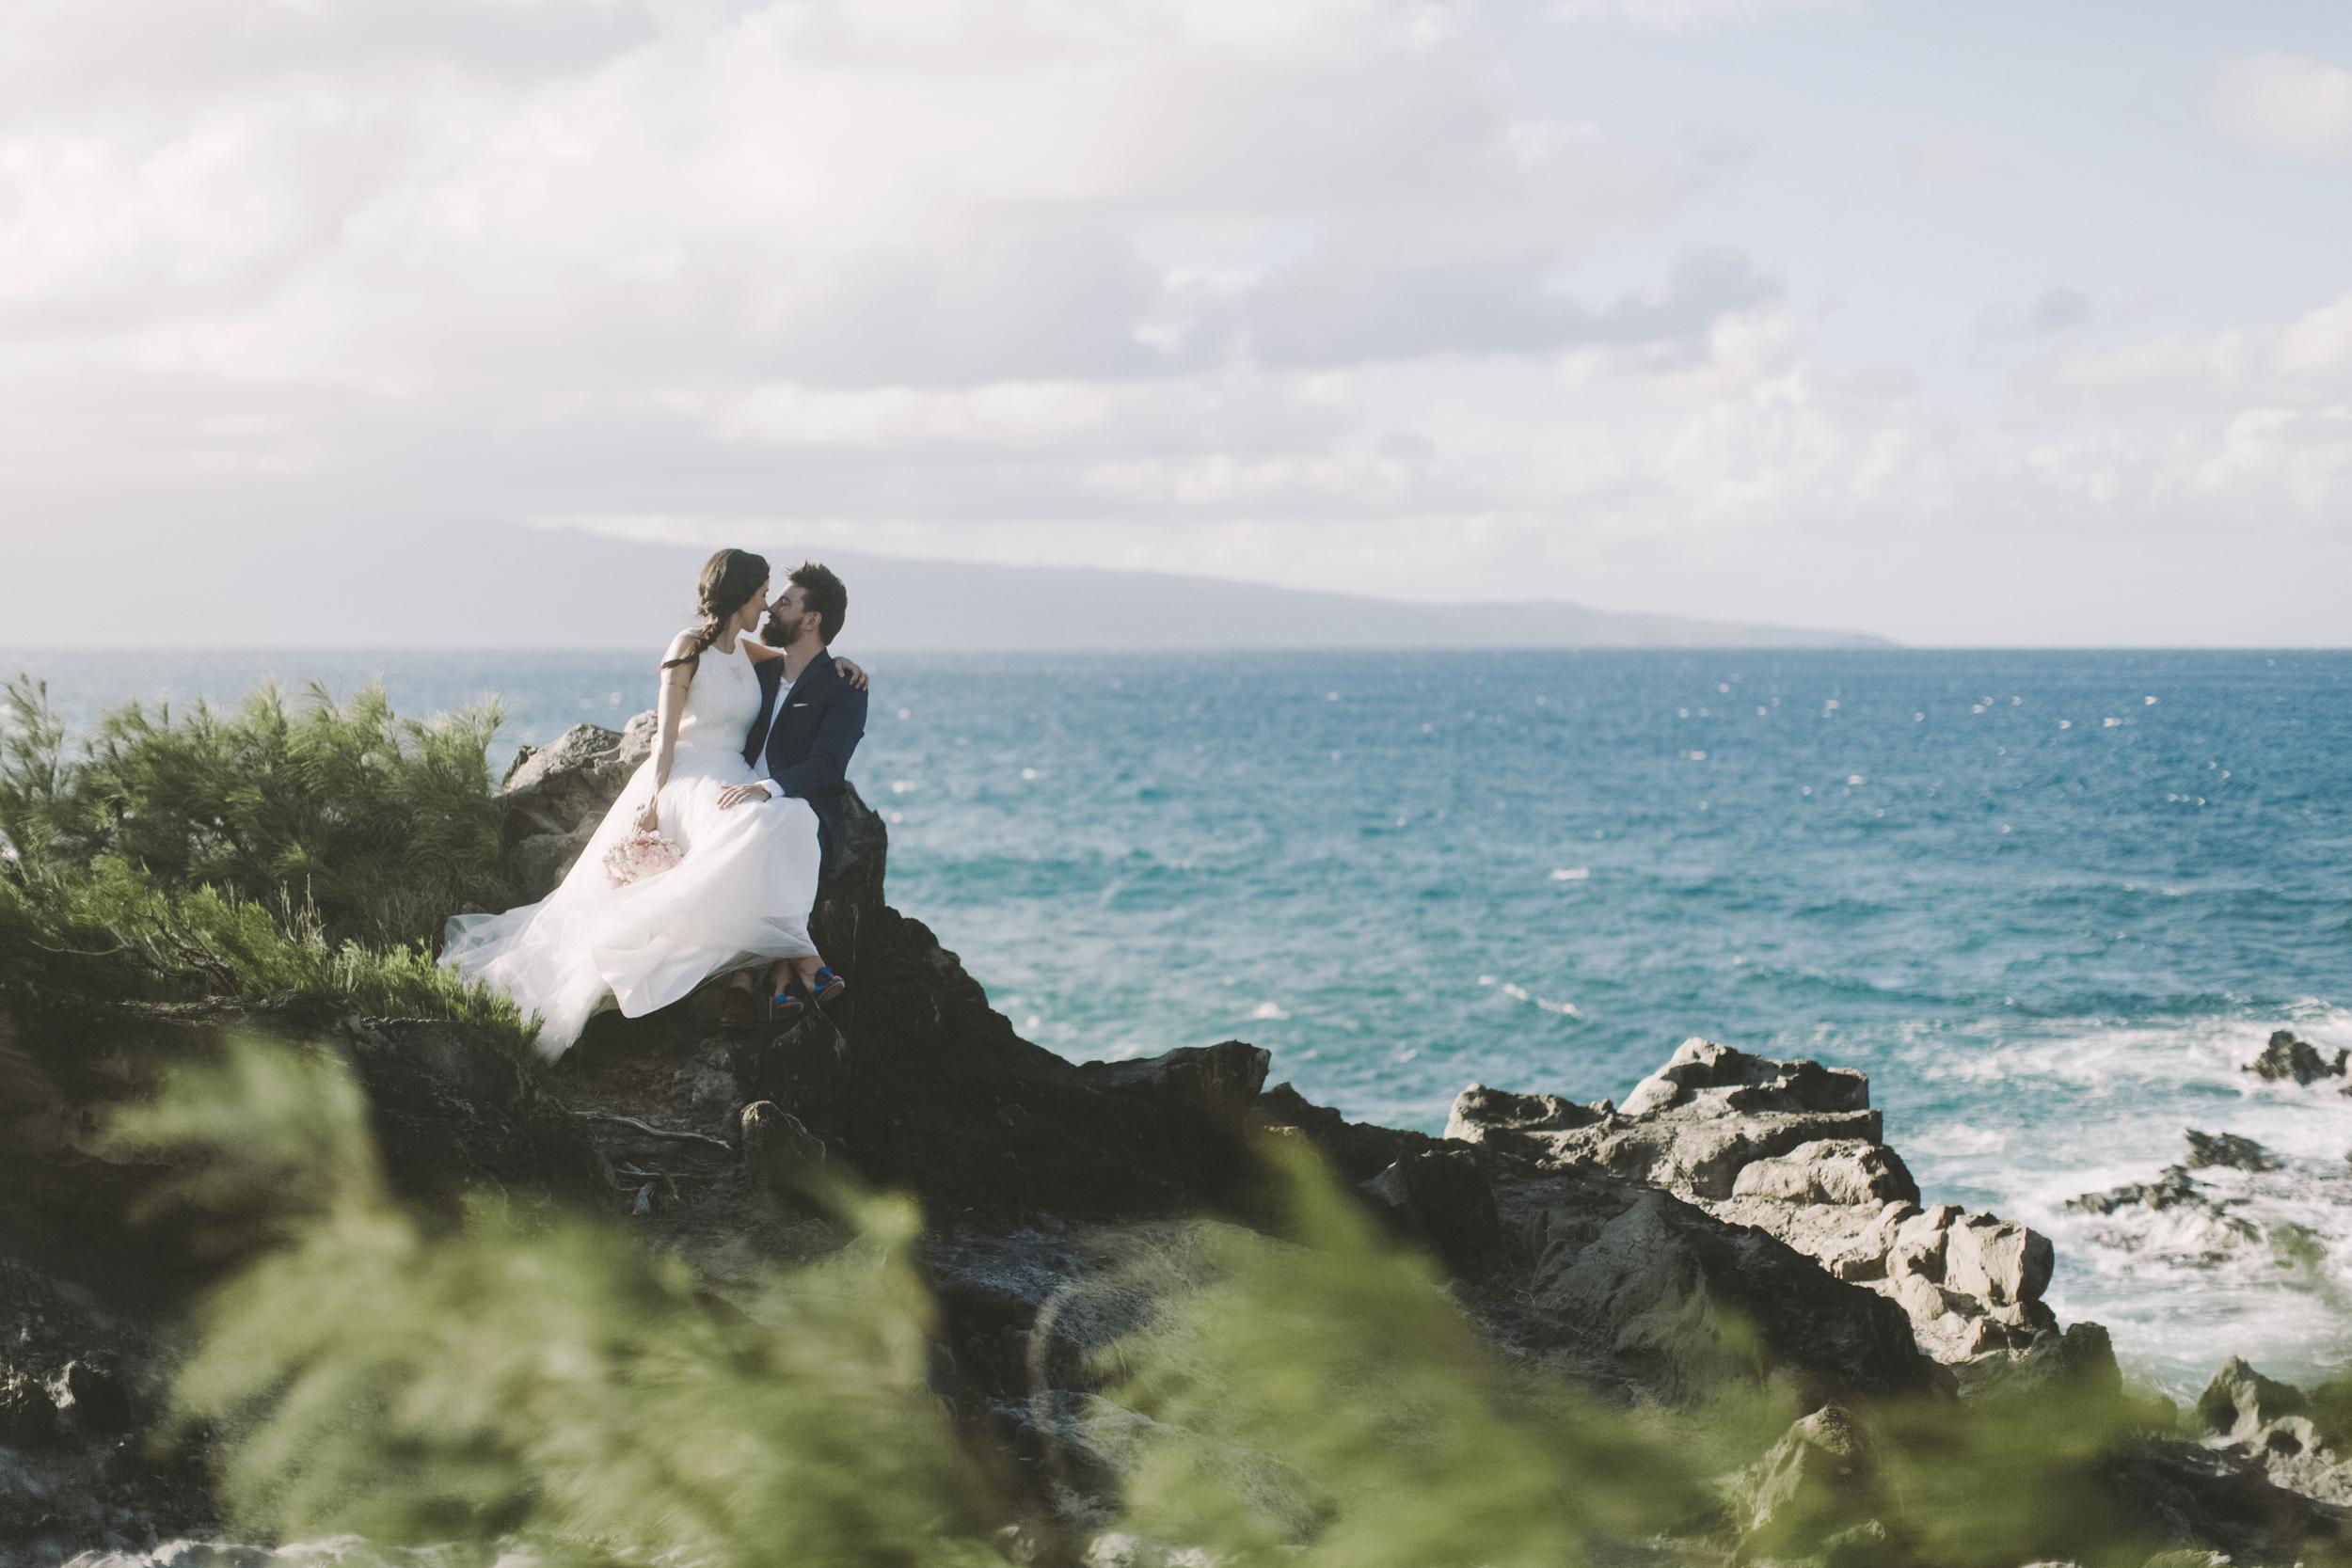 angie-diaz-photography-maui-wedding-ironwoods-beach-45.jpg